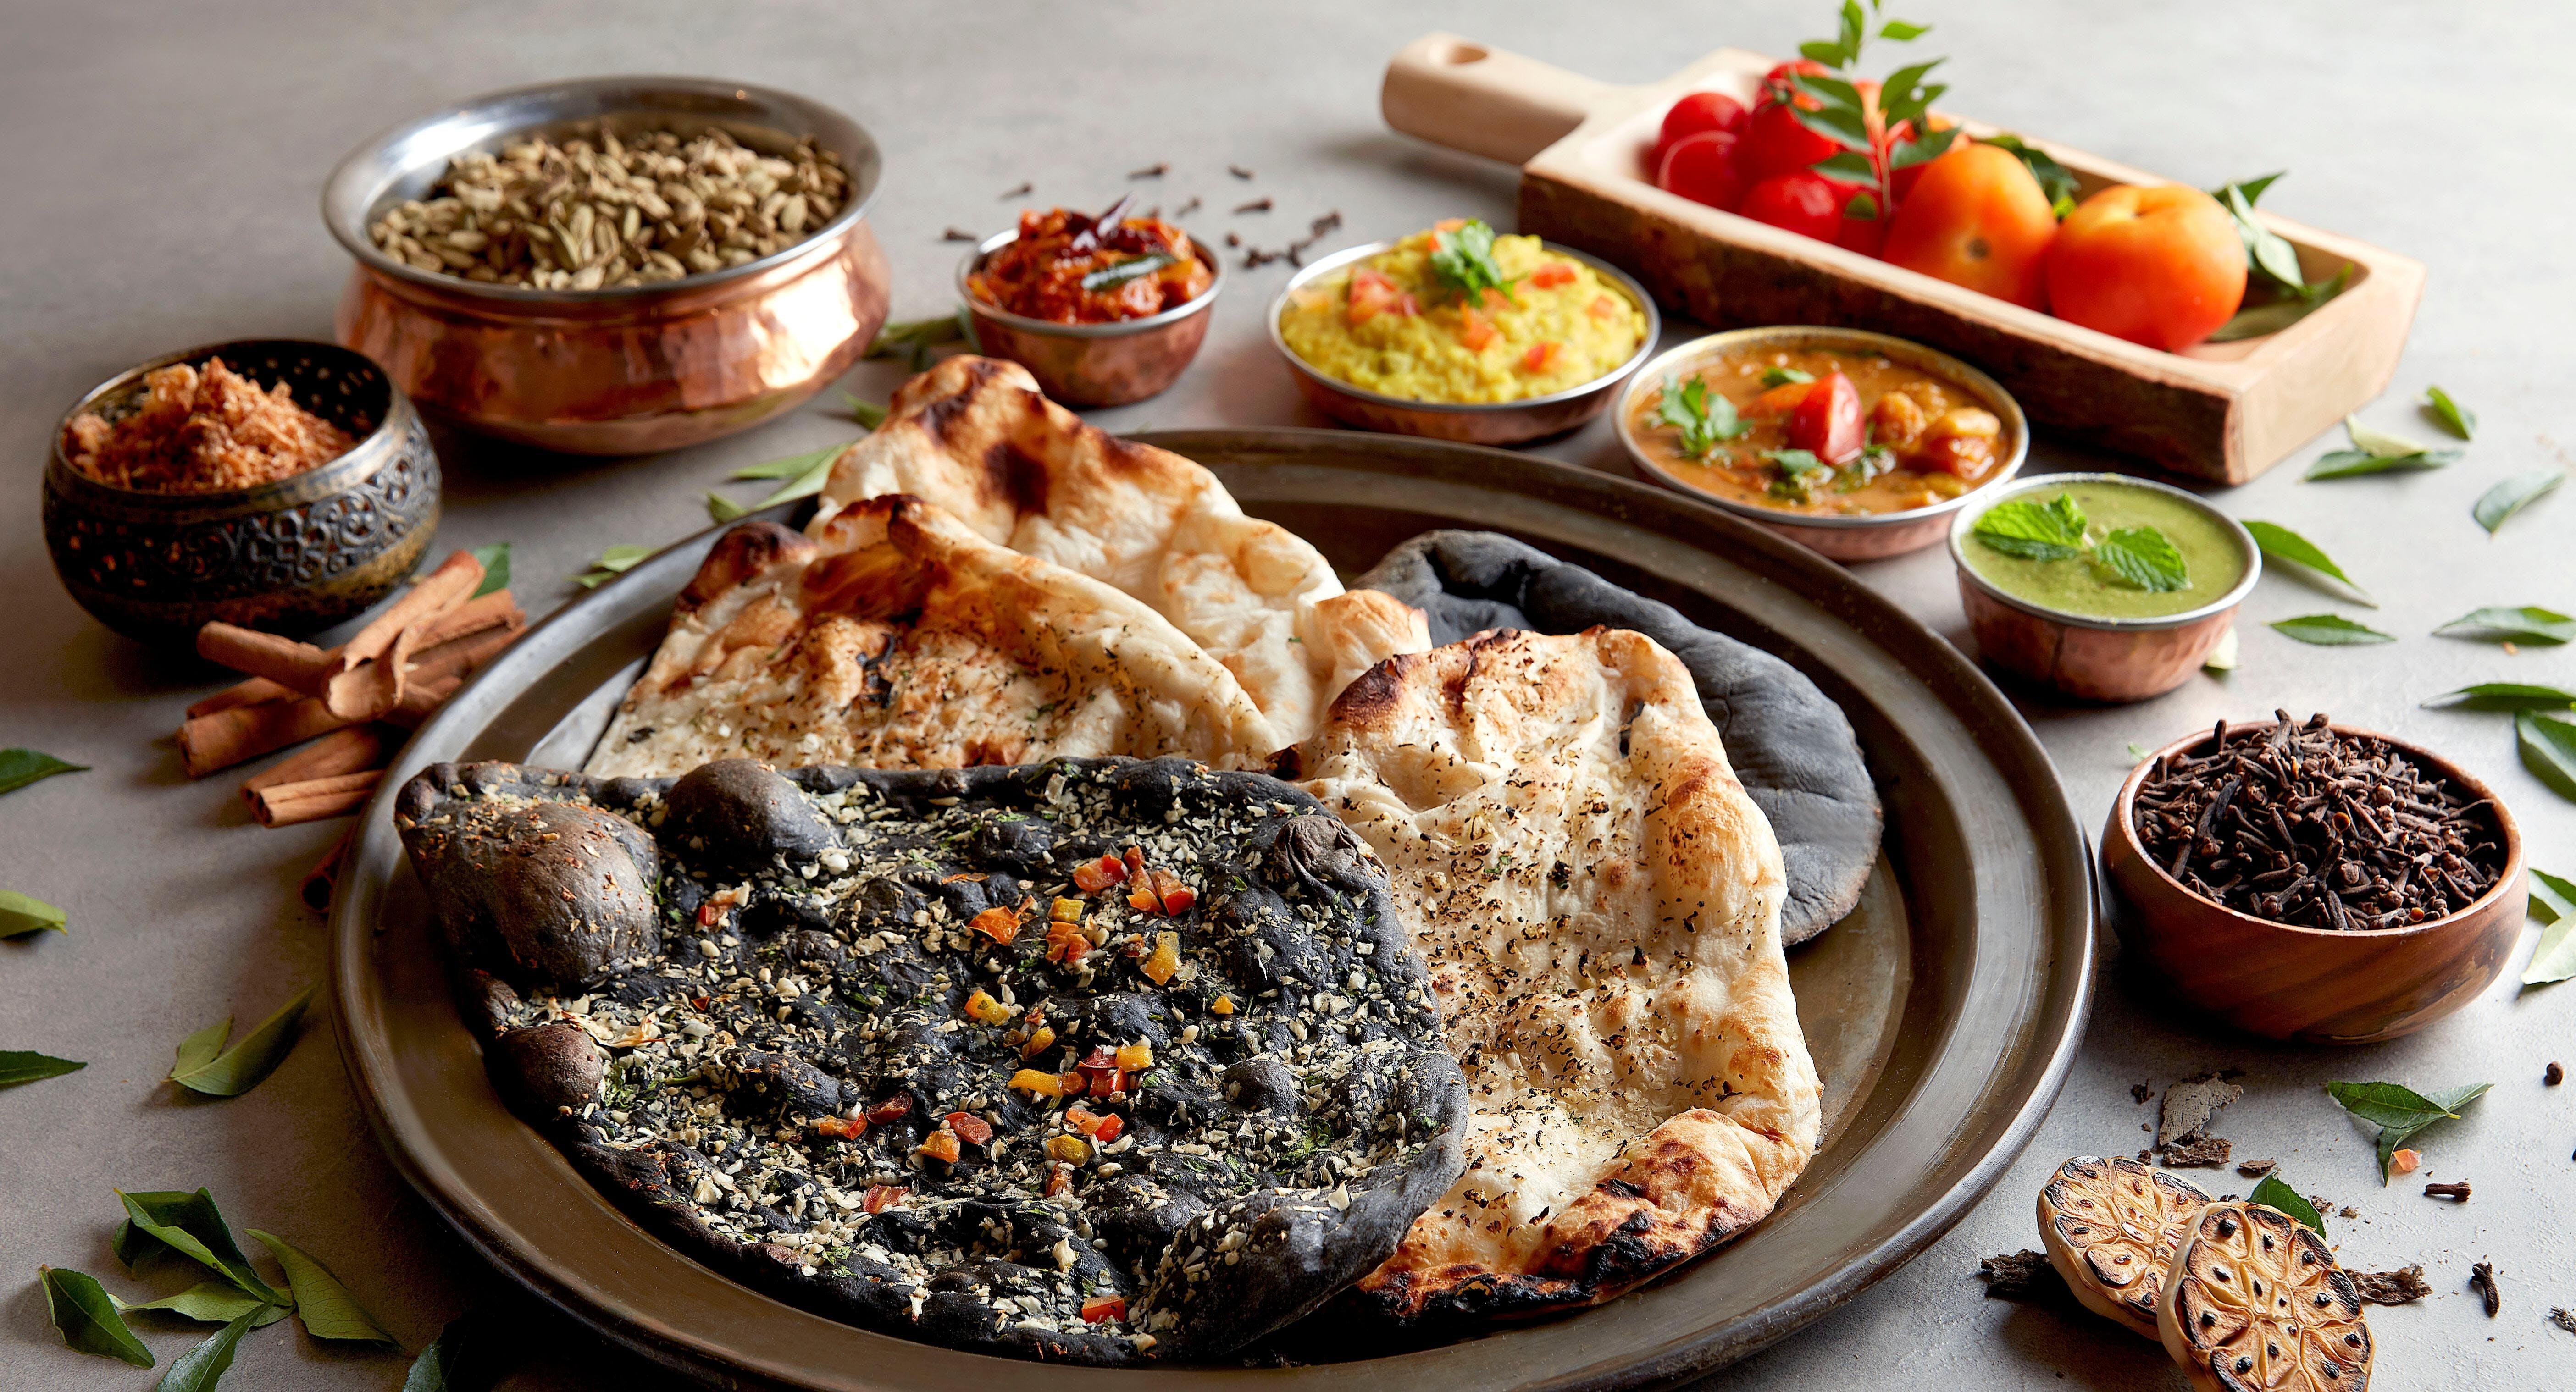 Spice Brasserie at PARKROYAL on Kitchener Road